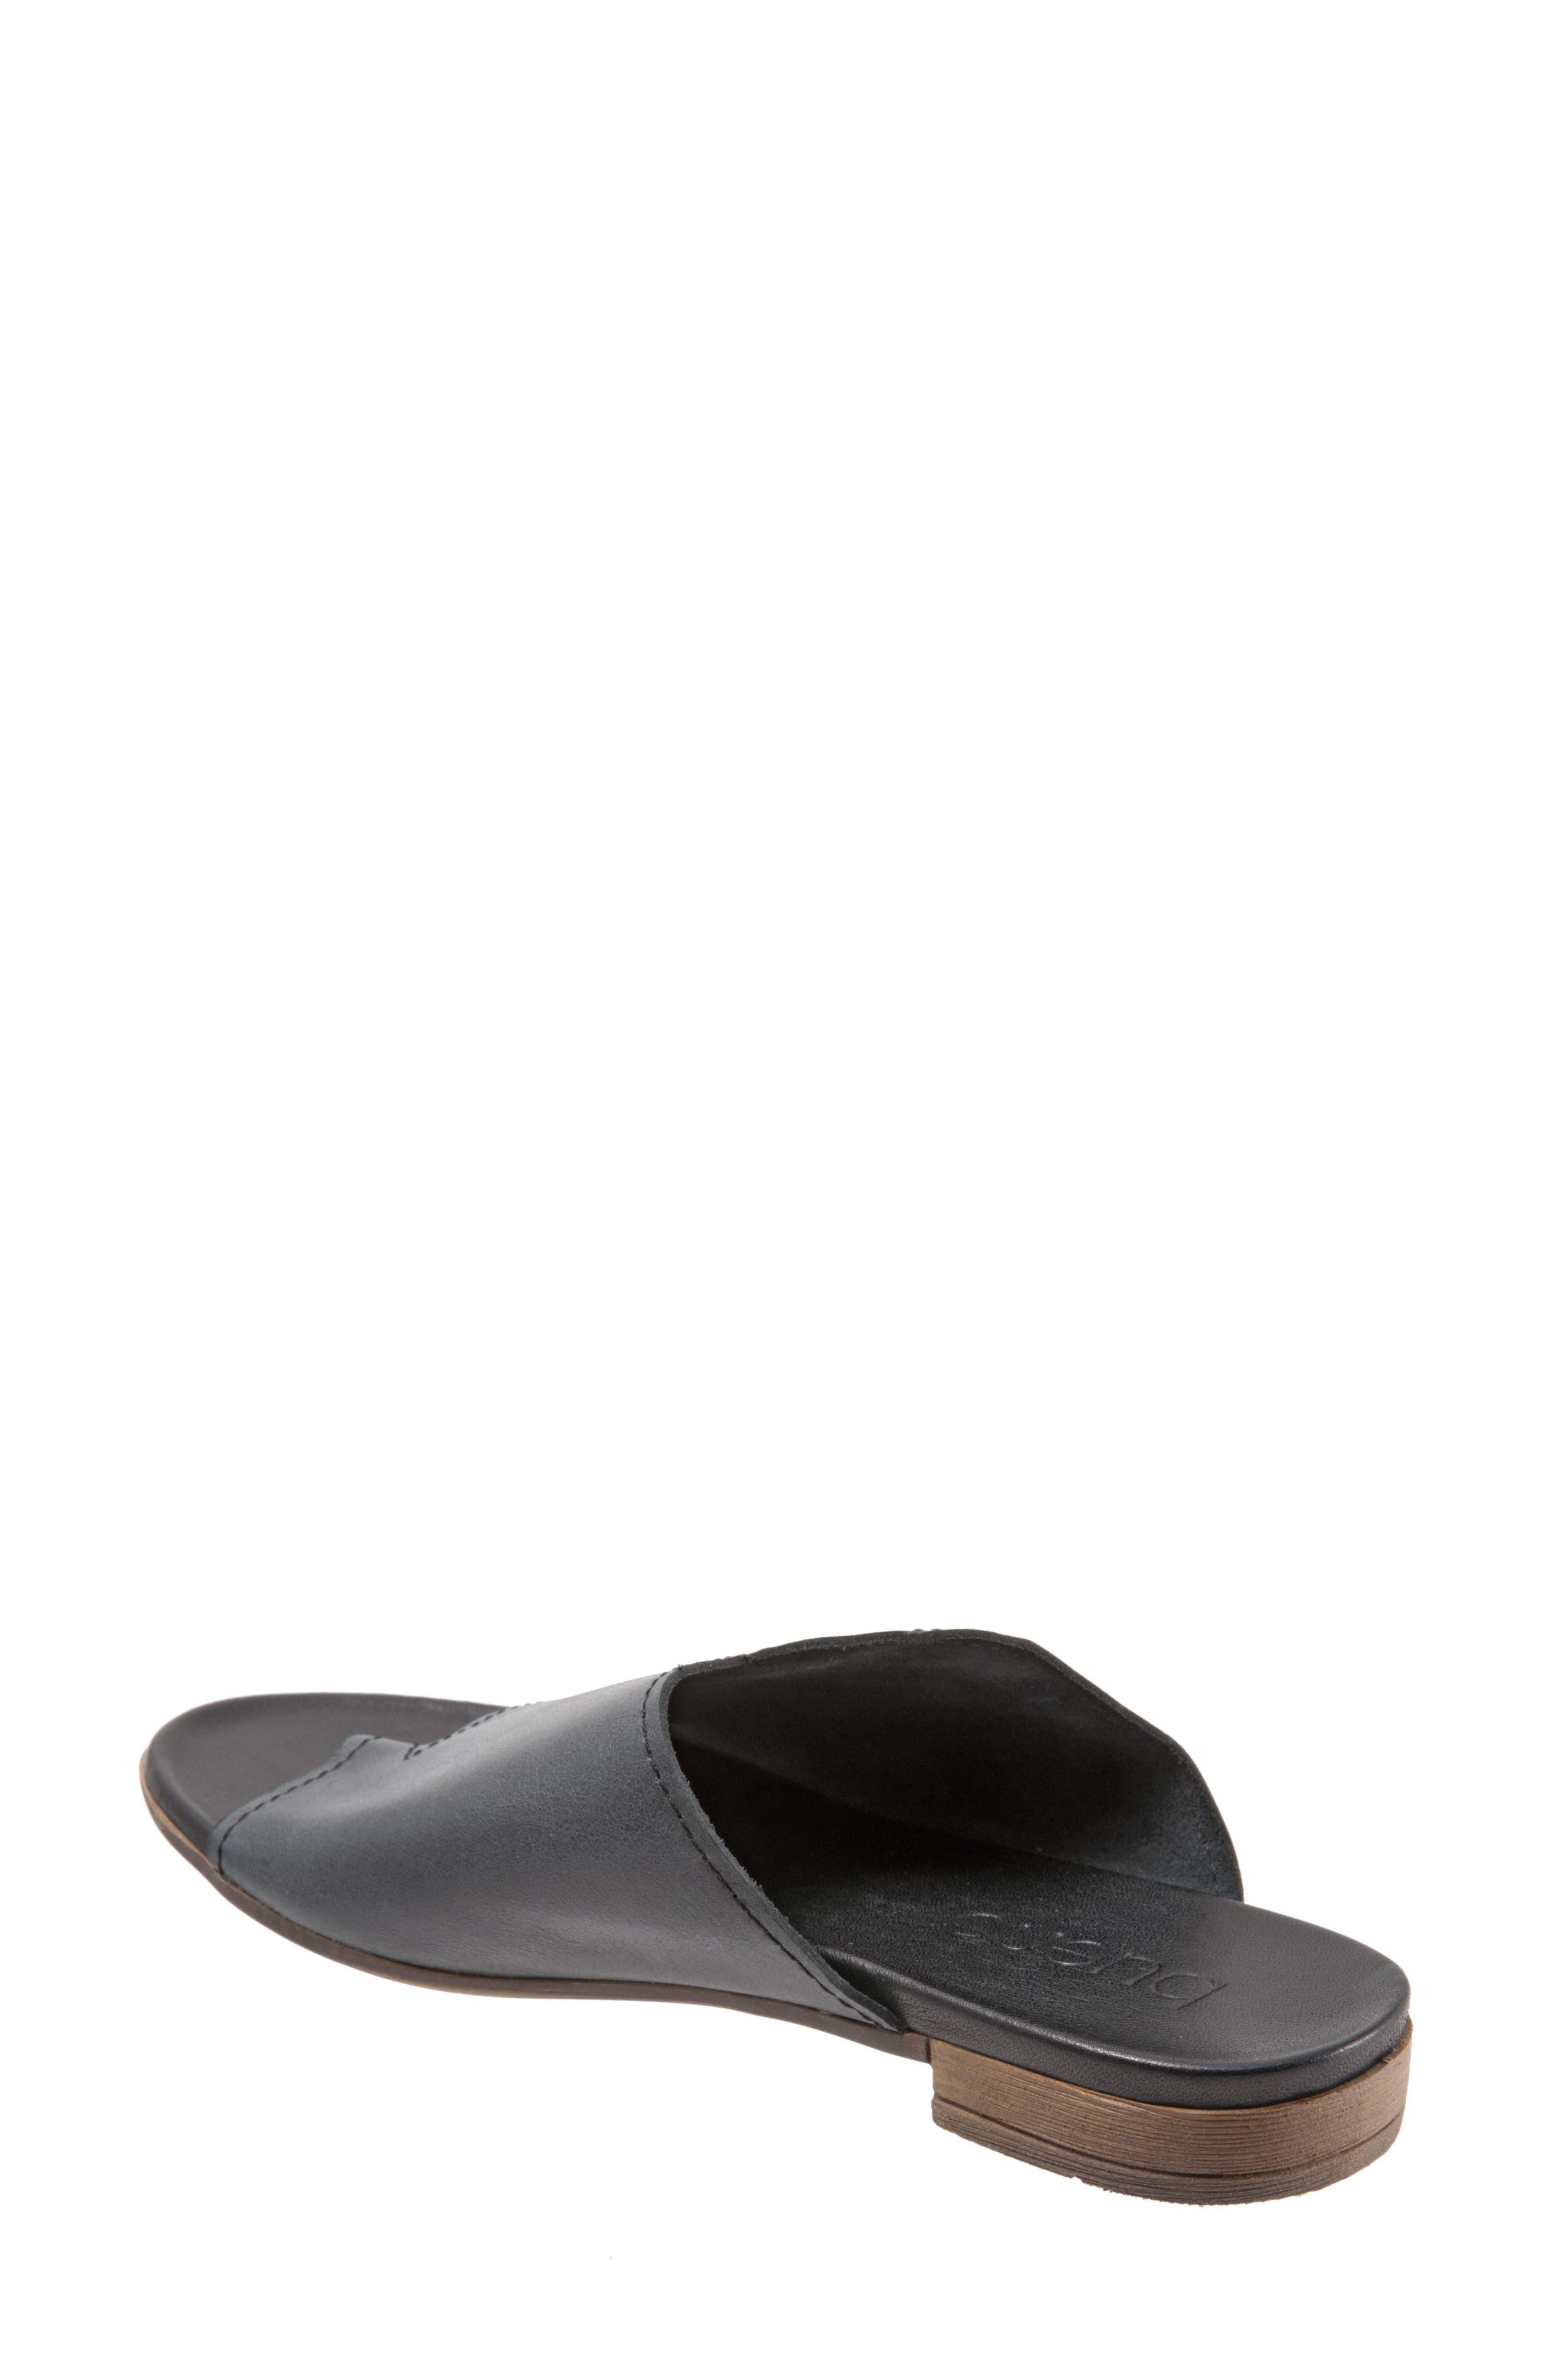 Tulla Sandal,                             Alternate thumbnail 2, color,                             Black Leather